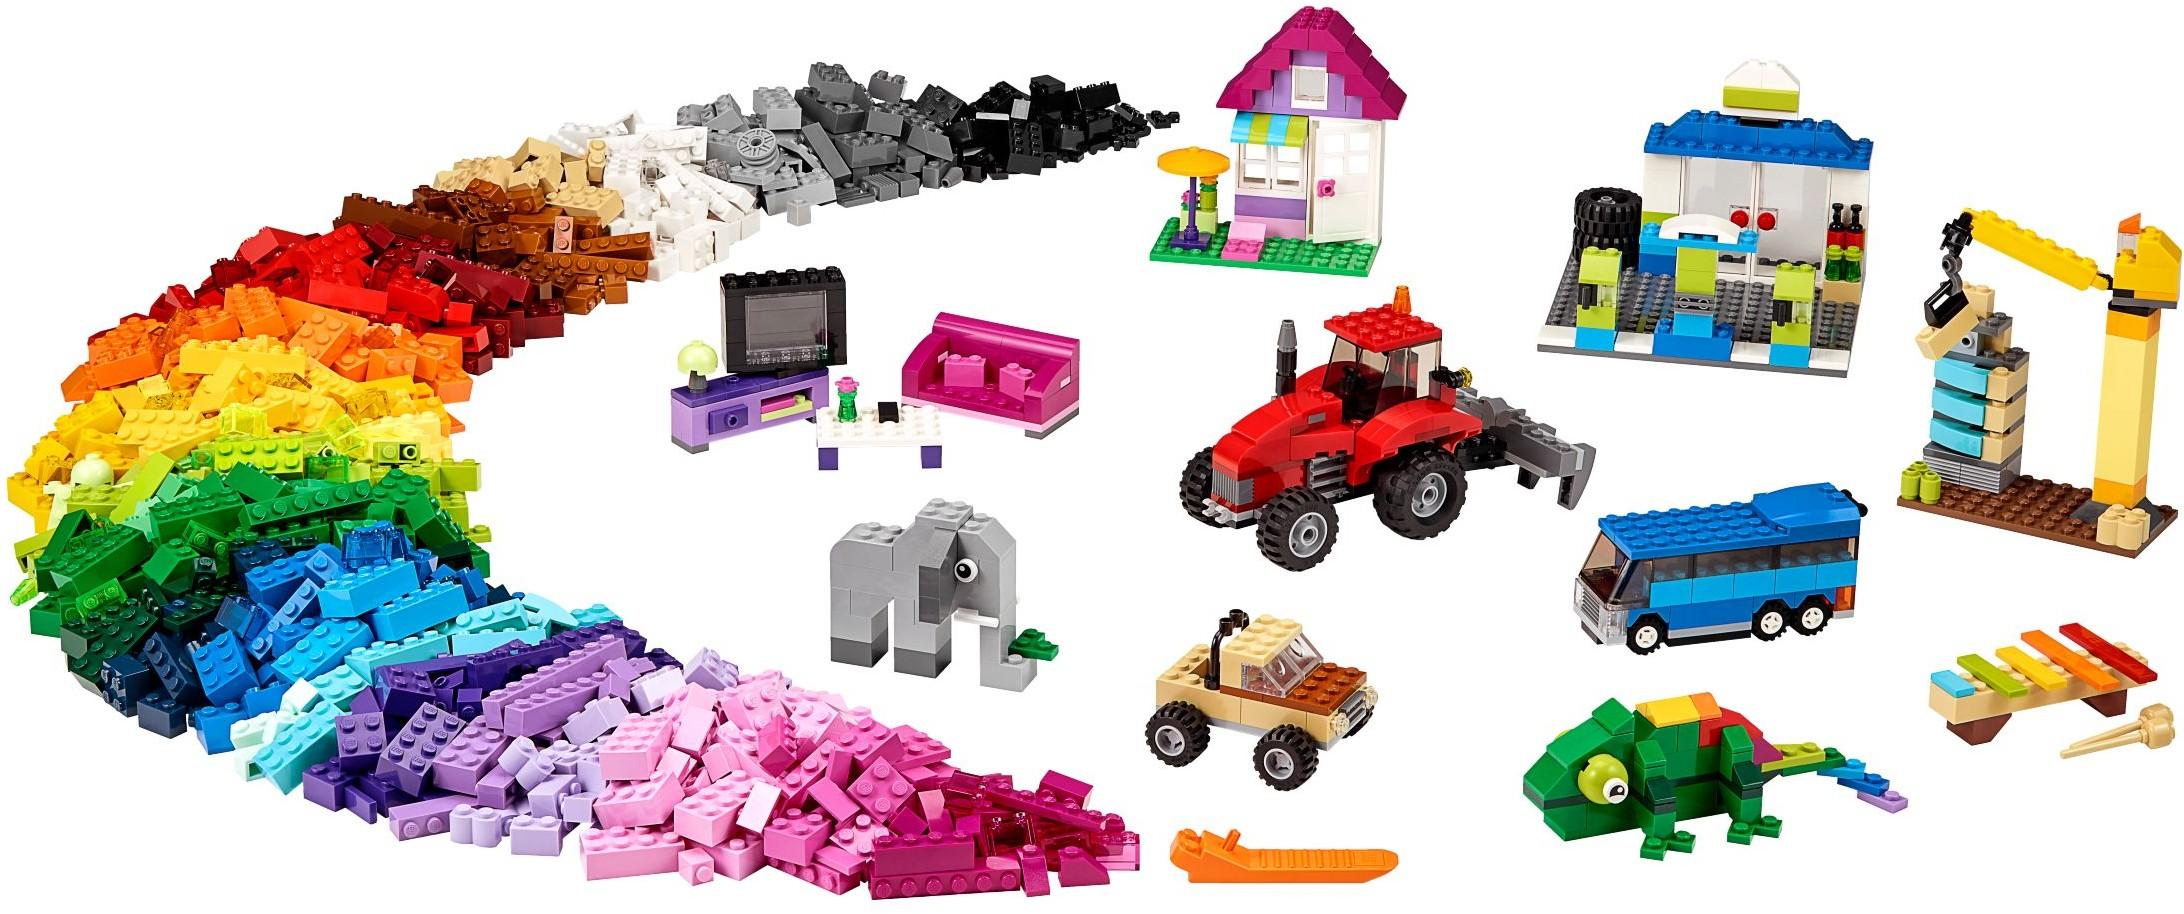 Lego classic large creative box 10697 walmart black friday deal the brick - Lego construction maison ...